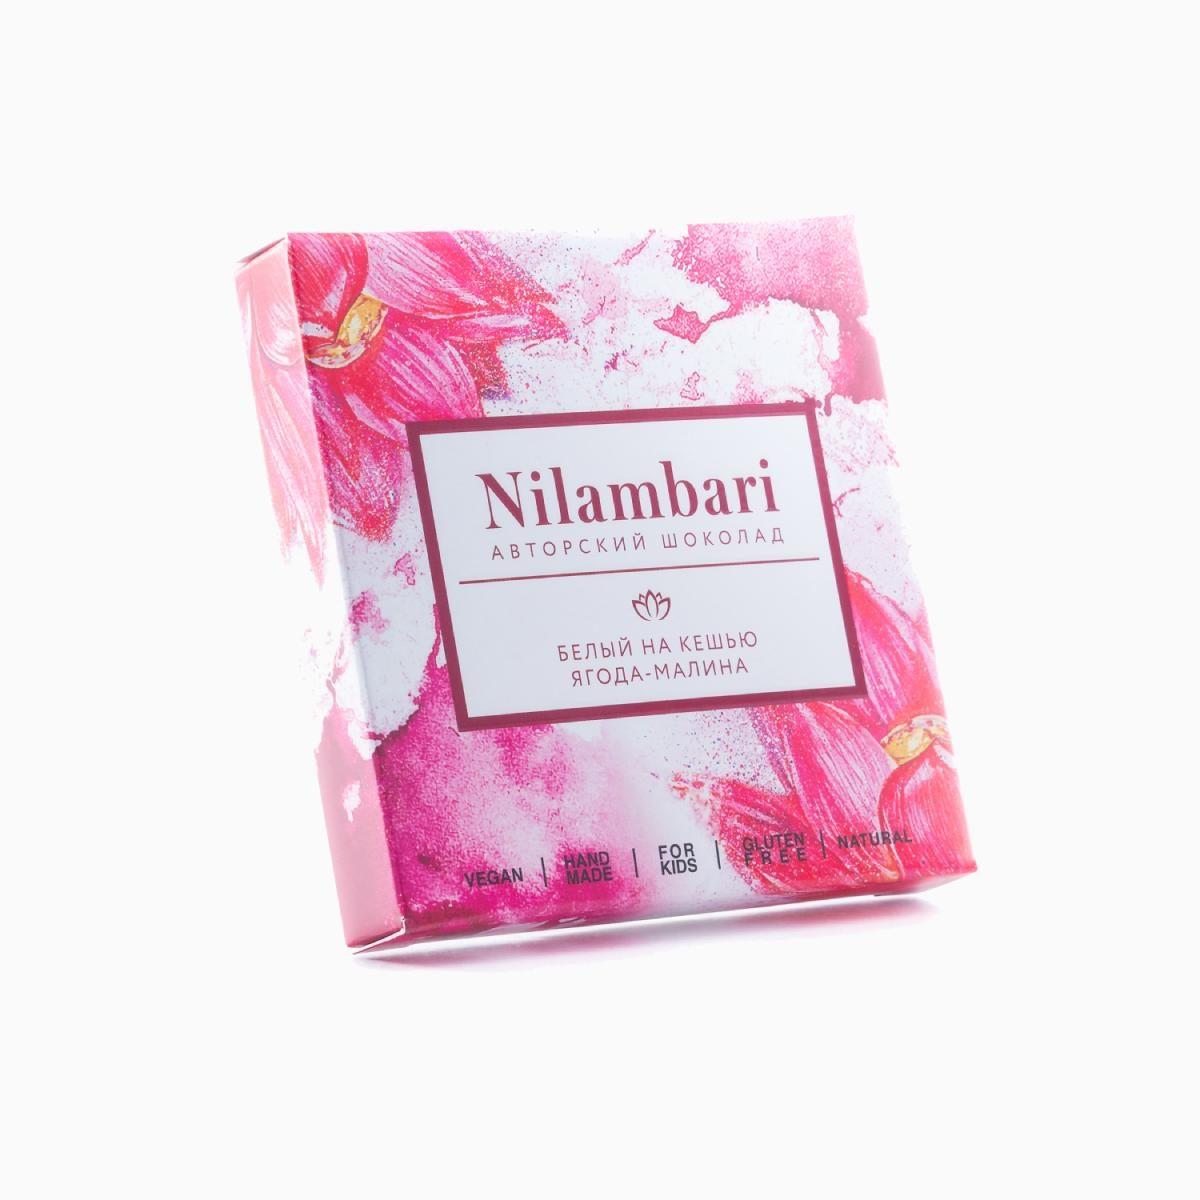 "Шоколад белый на кешью ""Ягода-Малина"", Nilambari, 65 г"